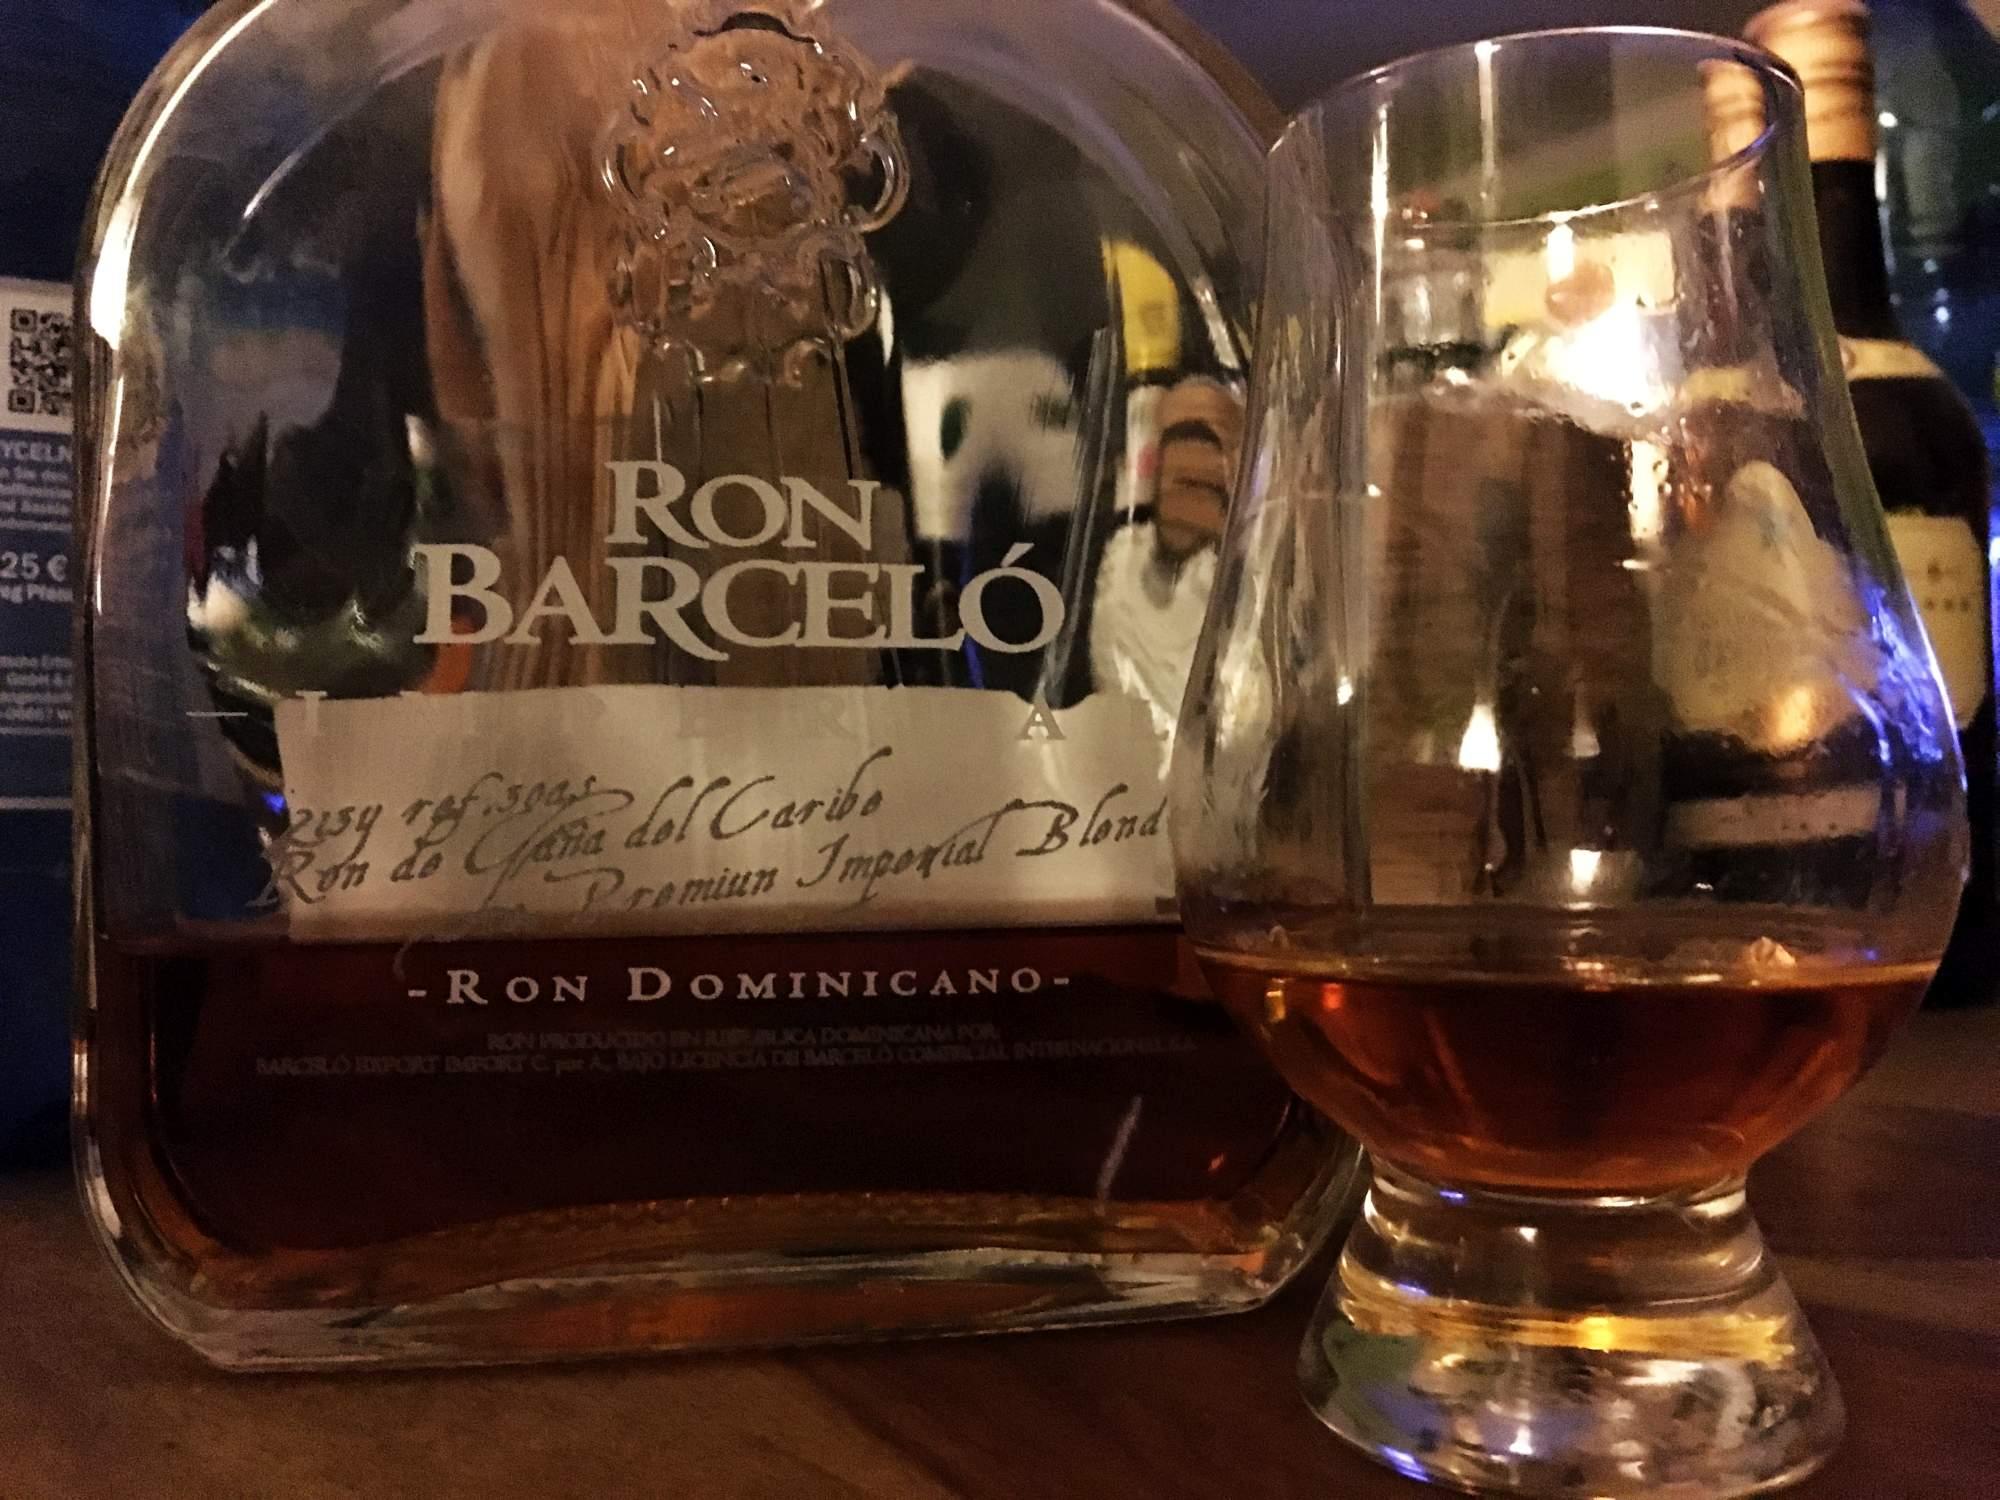 Ron Barceló Imperial im Glencairn-Glas.